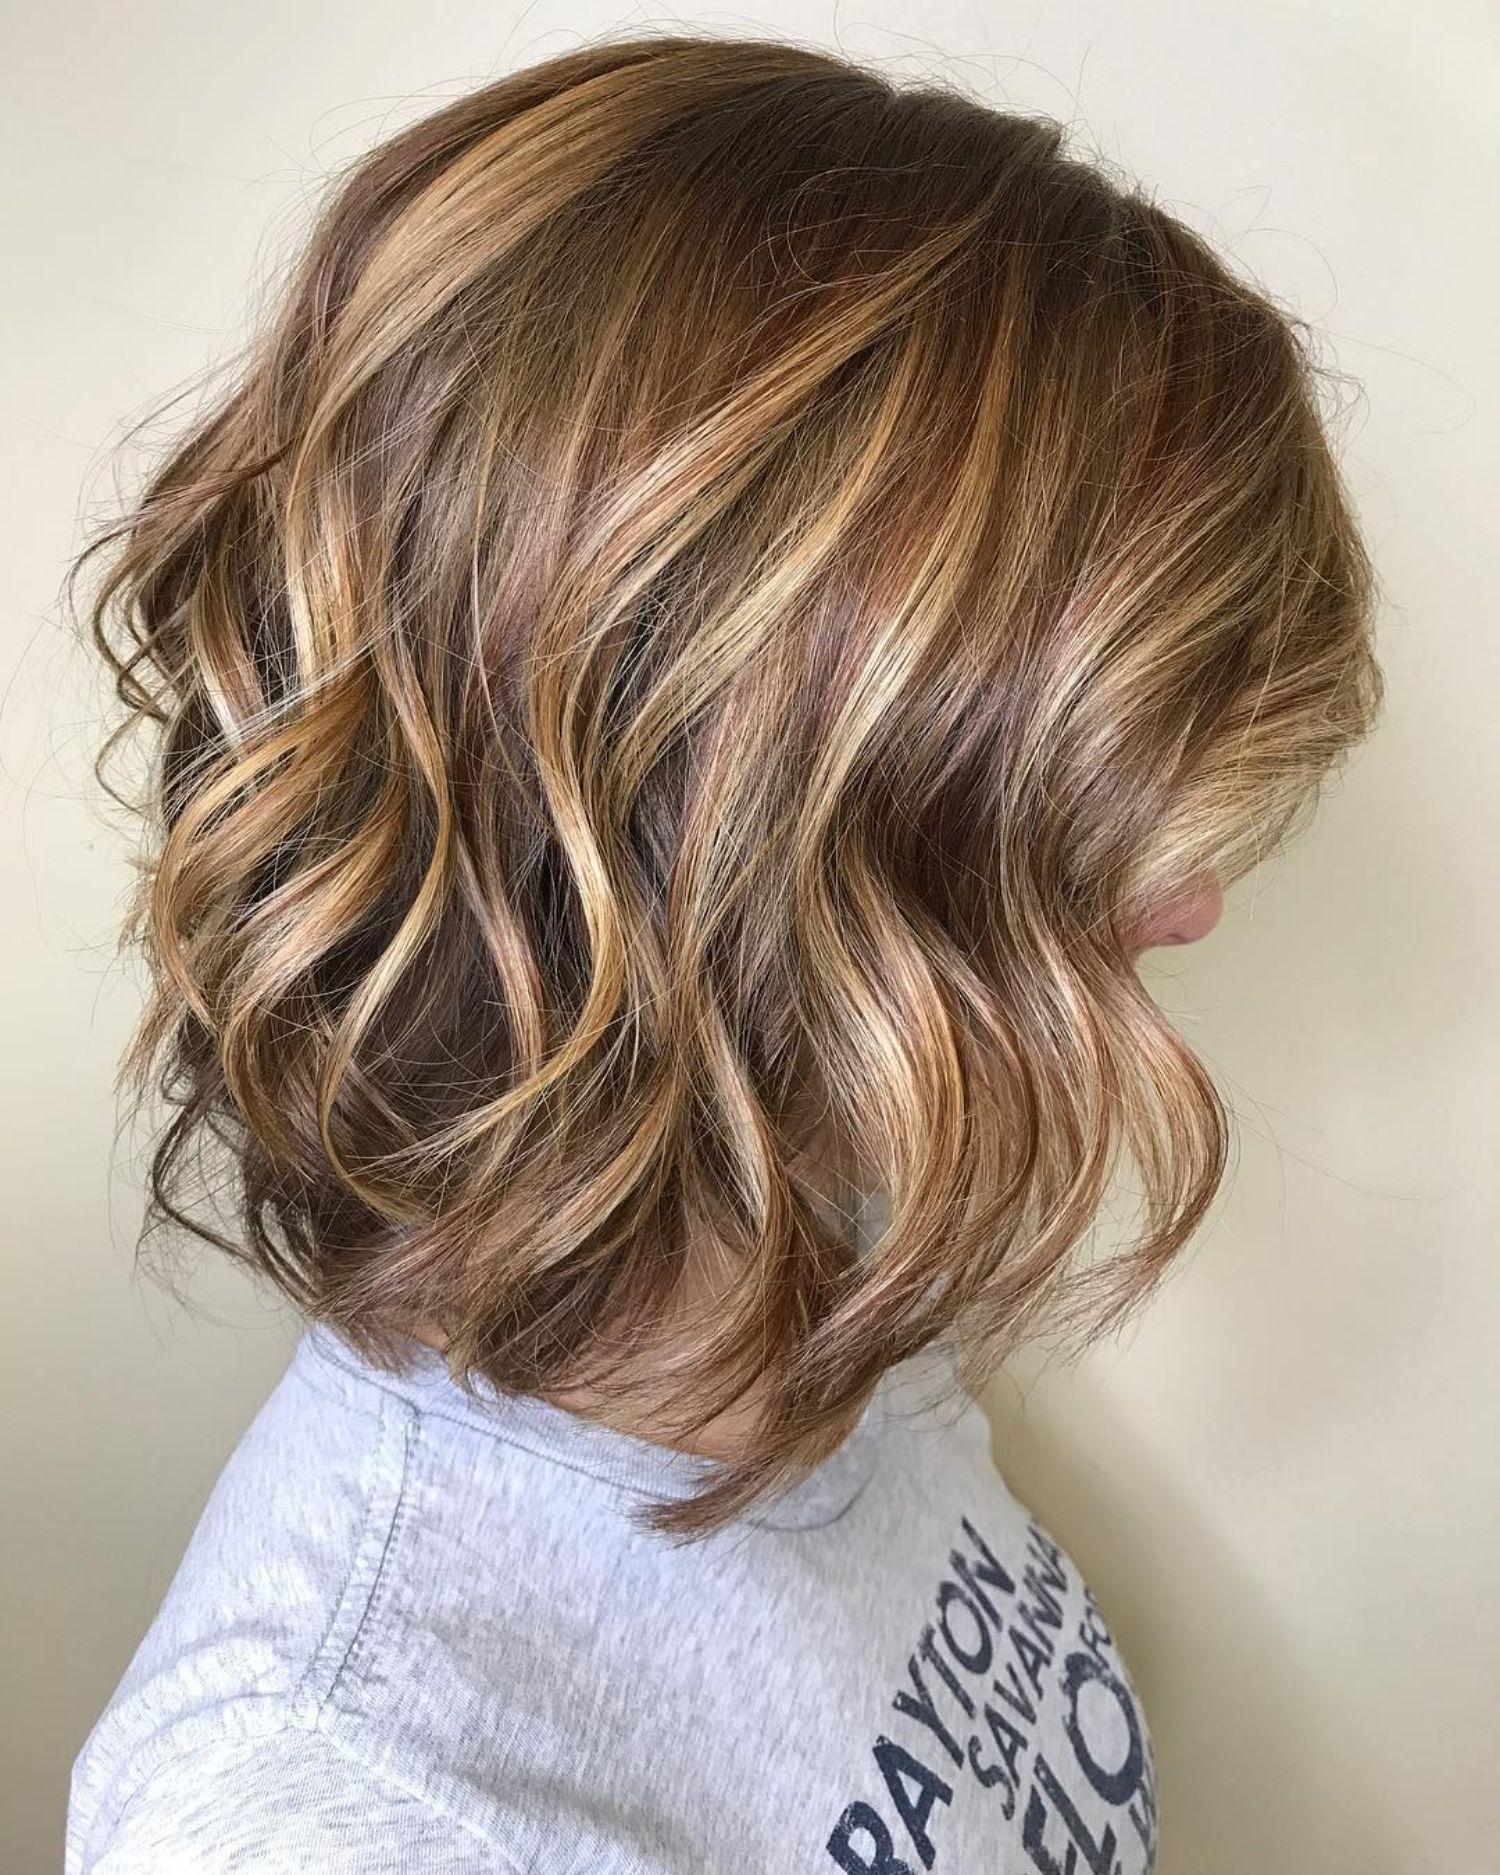 70 Perfect Medium Length Hairstyles for Thin Hair | Thin ...